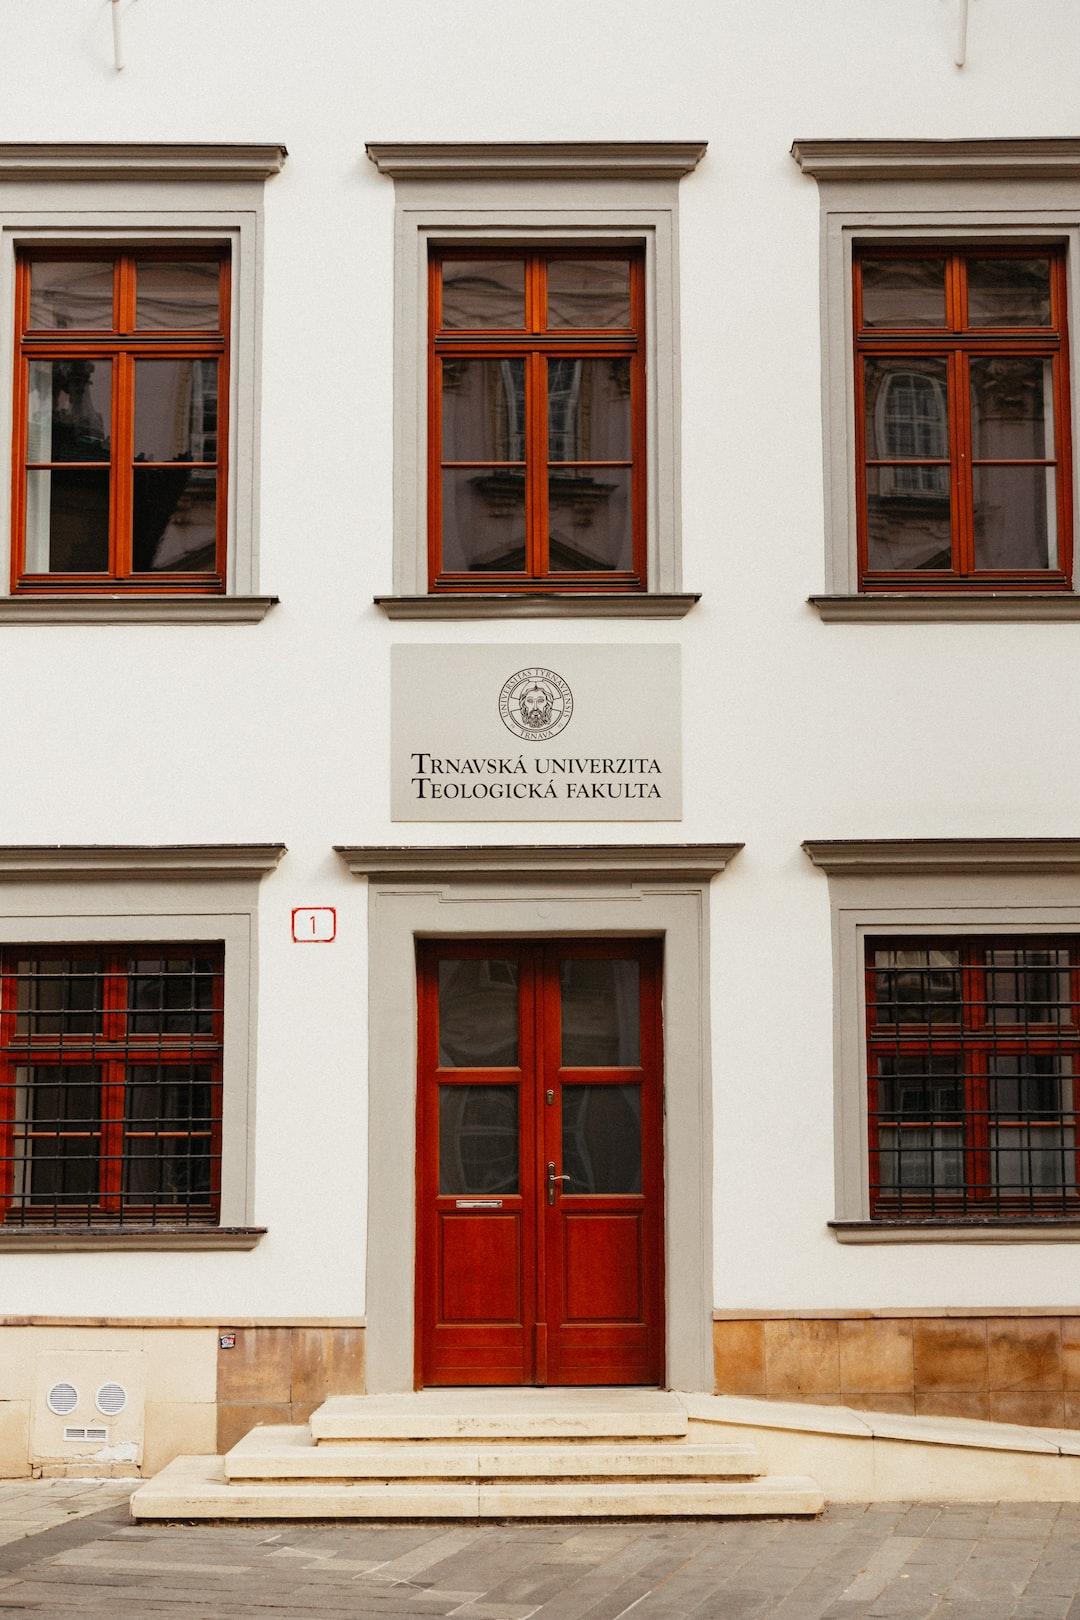 Faculty of Theology, Trnava University.